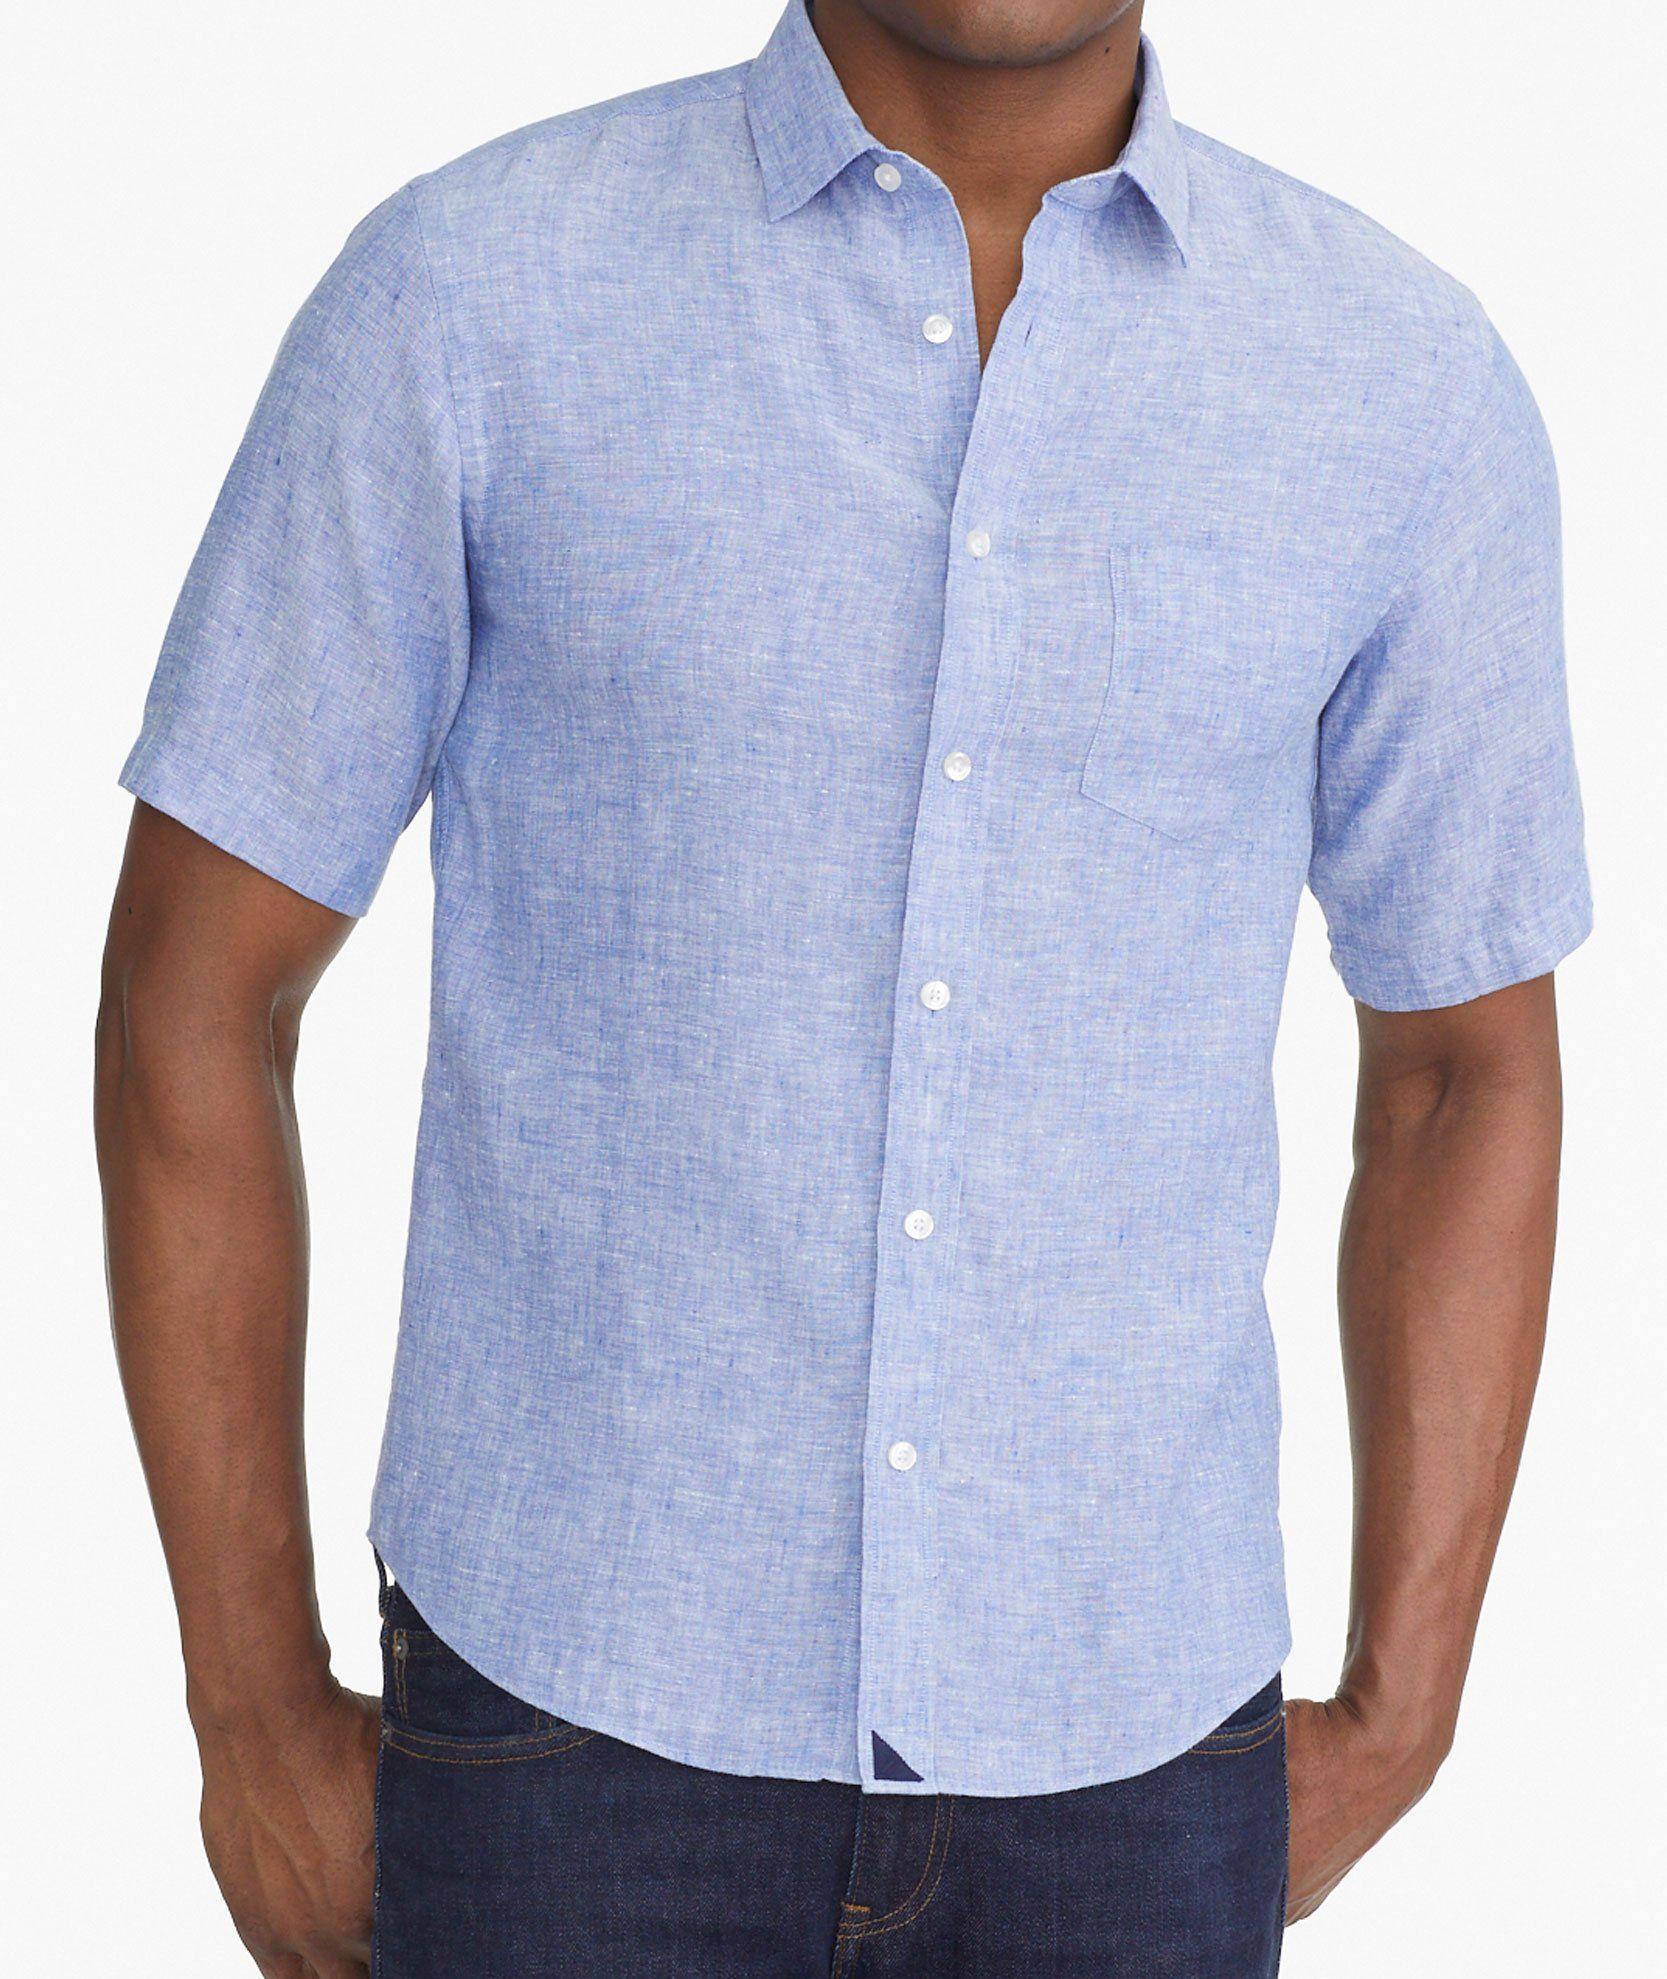 Xswsy XG Womens Henley Shirts Long Sleeve T Shirts Button Casual Tops